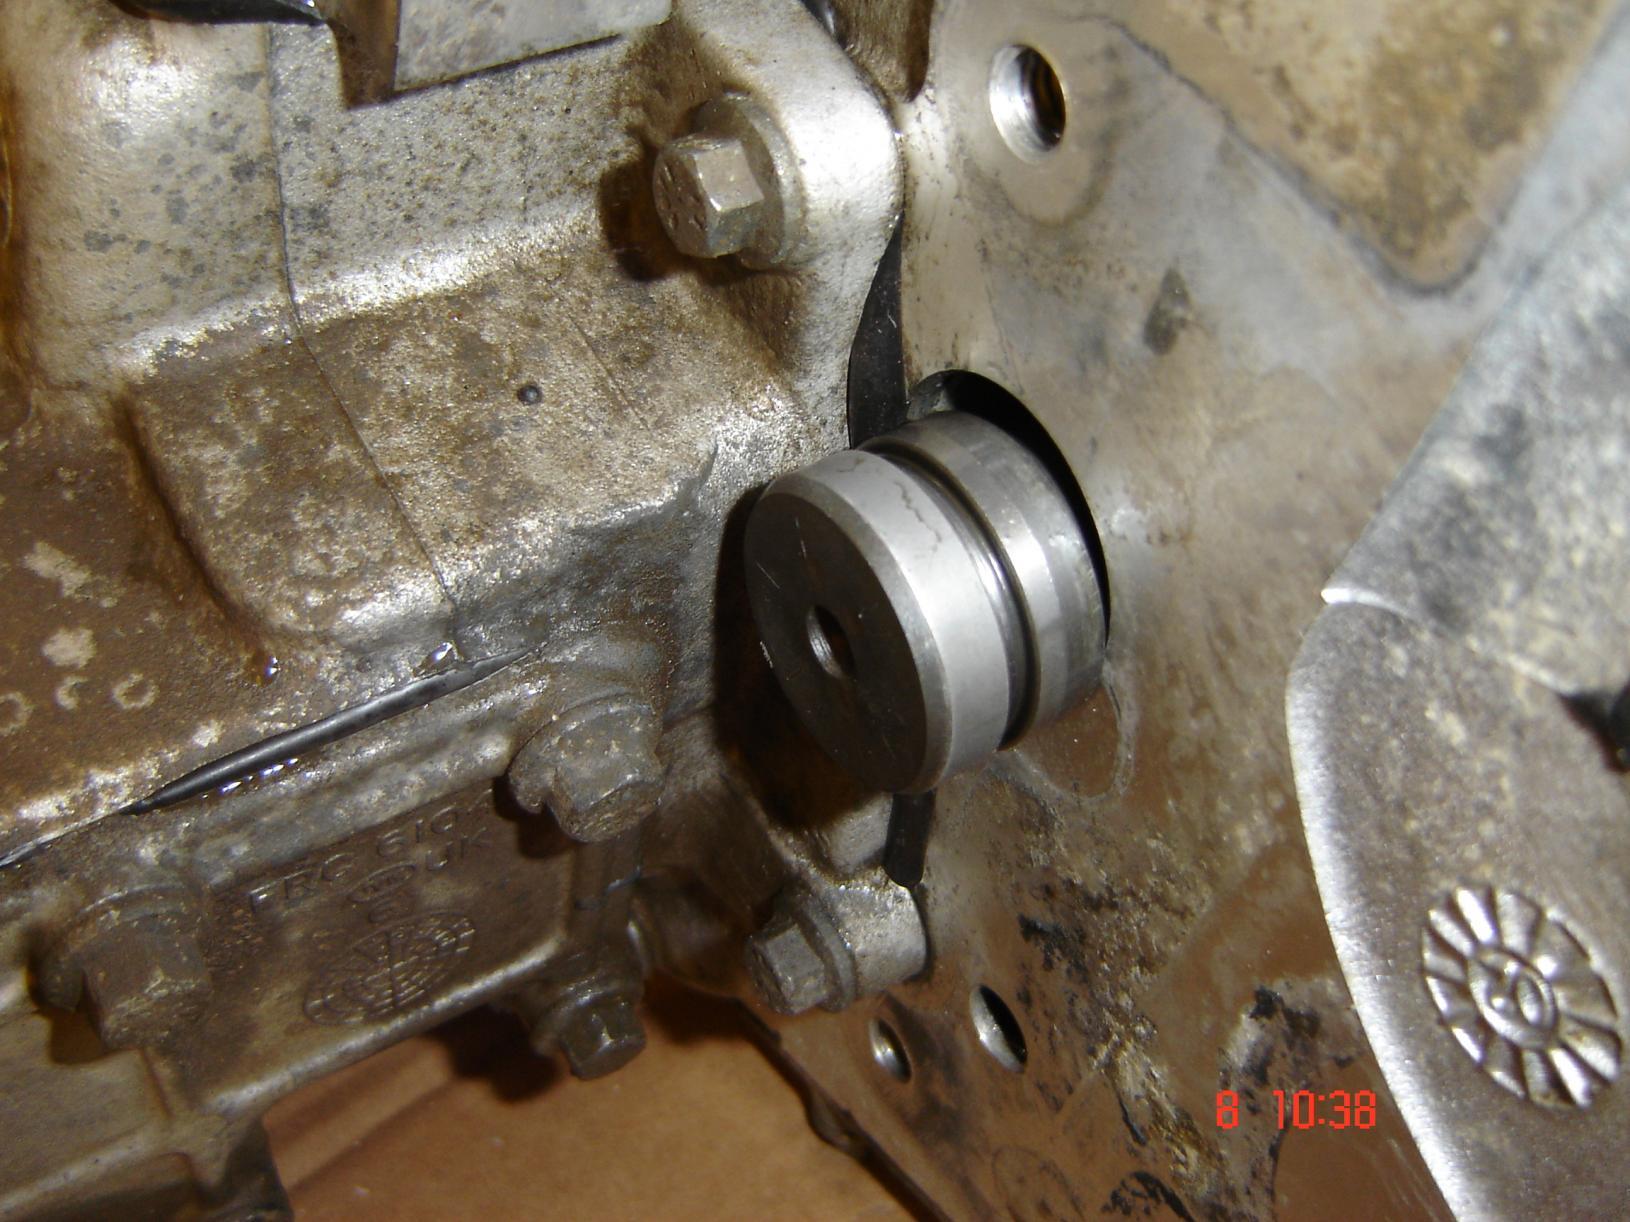 Land Rover Defender Td5 Transfer Box Removal Car Oil Leak Egr Valve Kit Source Auto Landyzone Forum